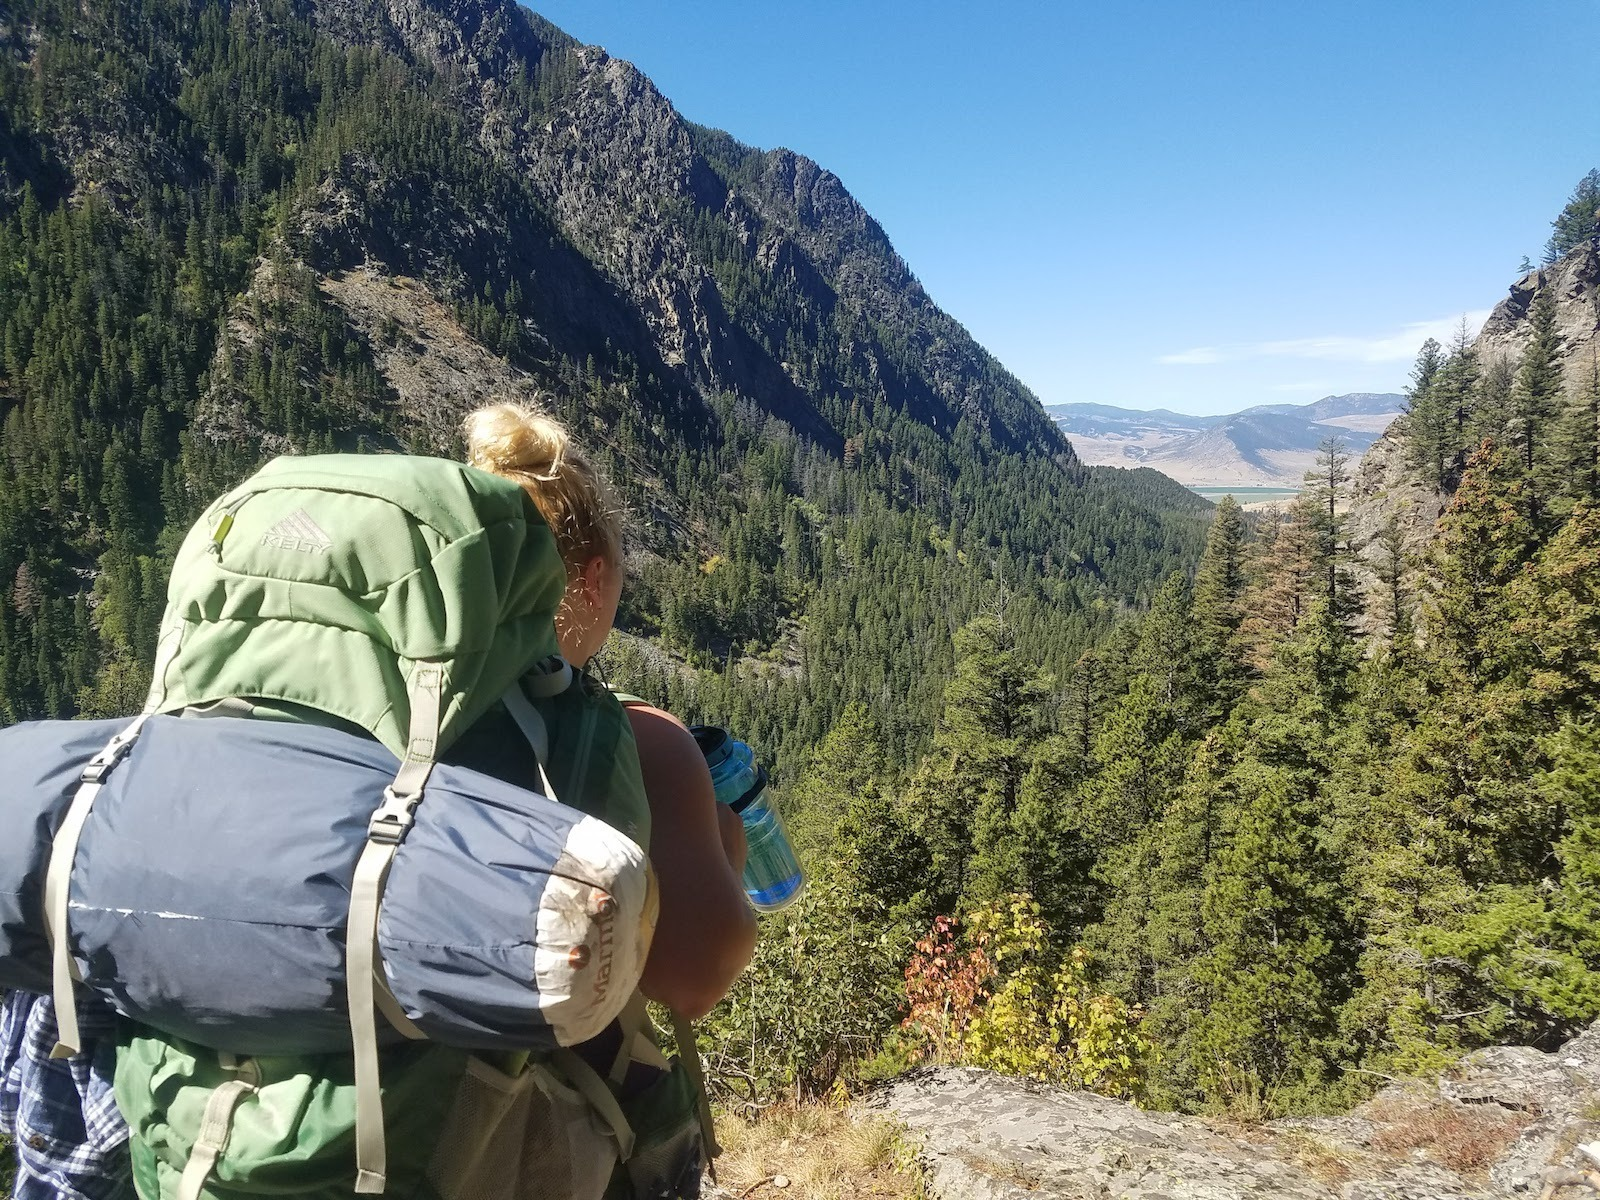 Woman hiking with beautiful views in Livingston Montana